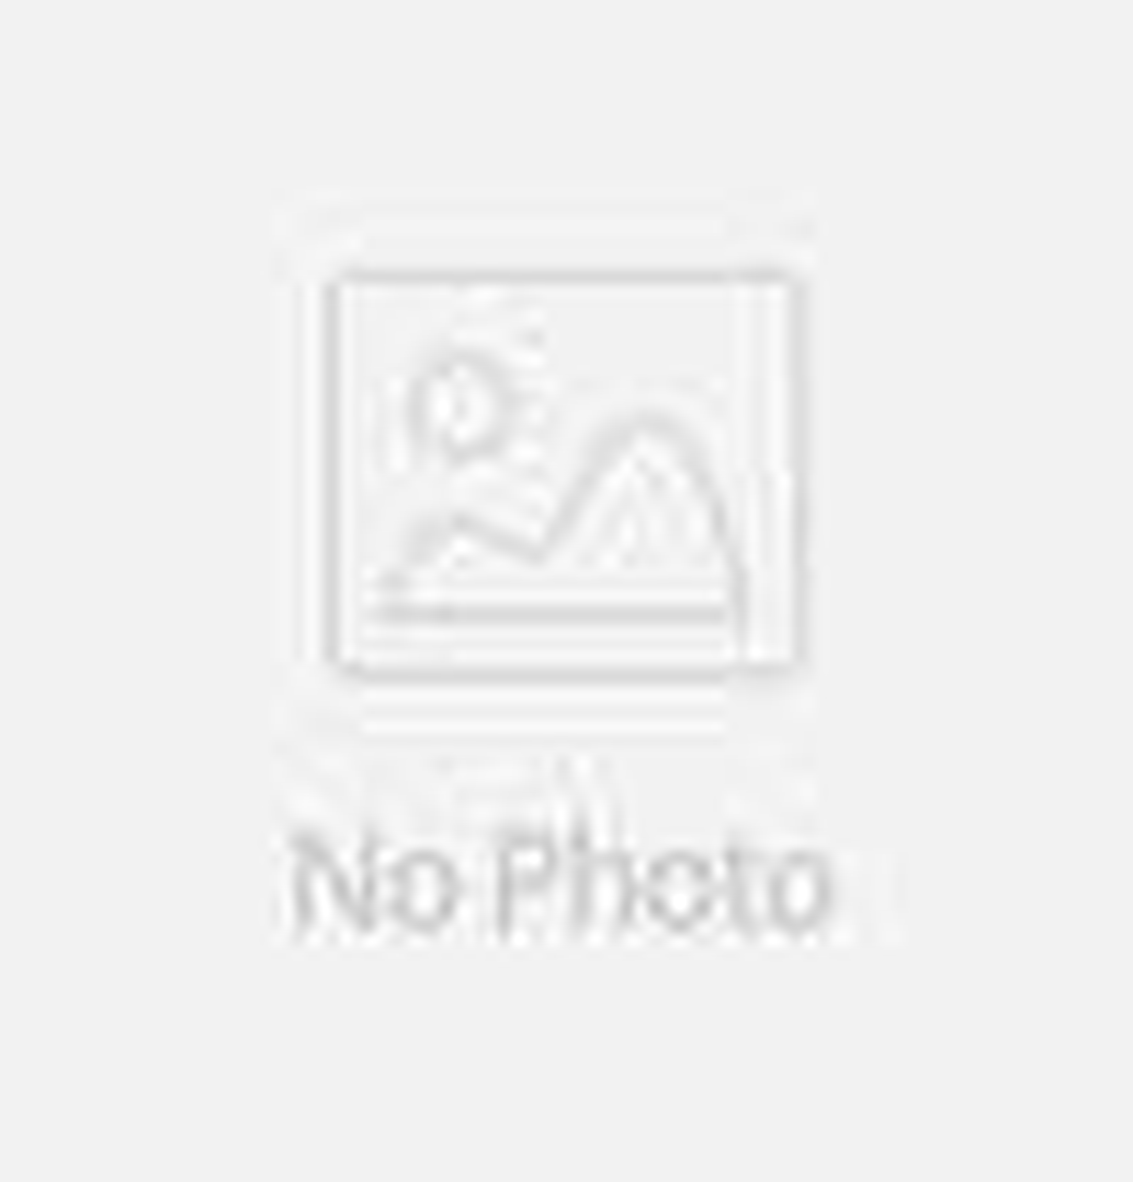 MK352 Outdoor Furniture